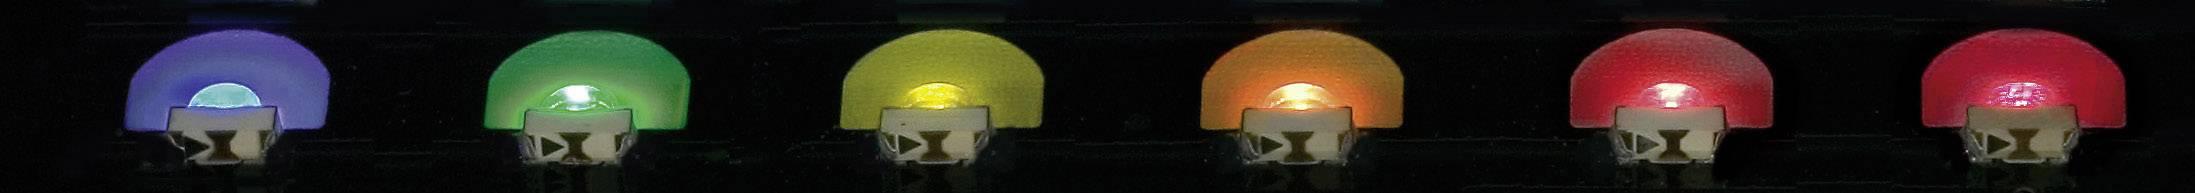 SMD LED speciální Everlight Opto, 12-215SURC/S530-A2/TR8, 20 mA, 2 V, 130 °, 48 mcd, červená